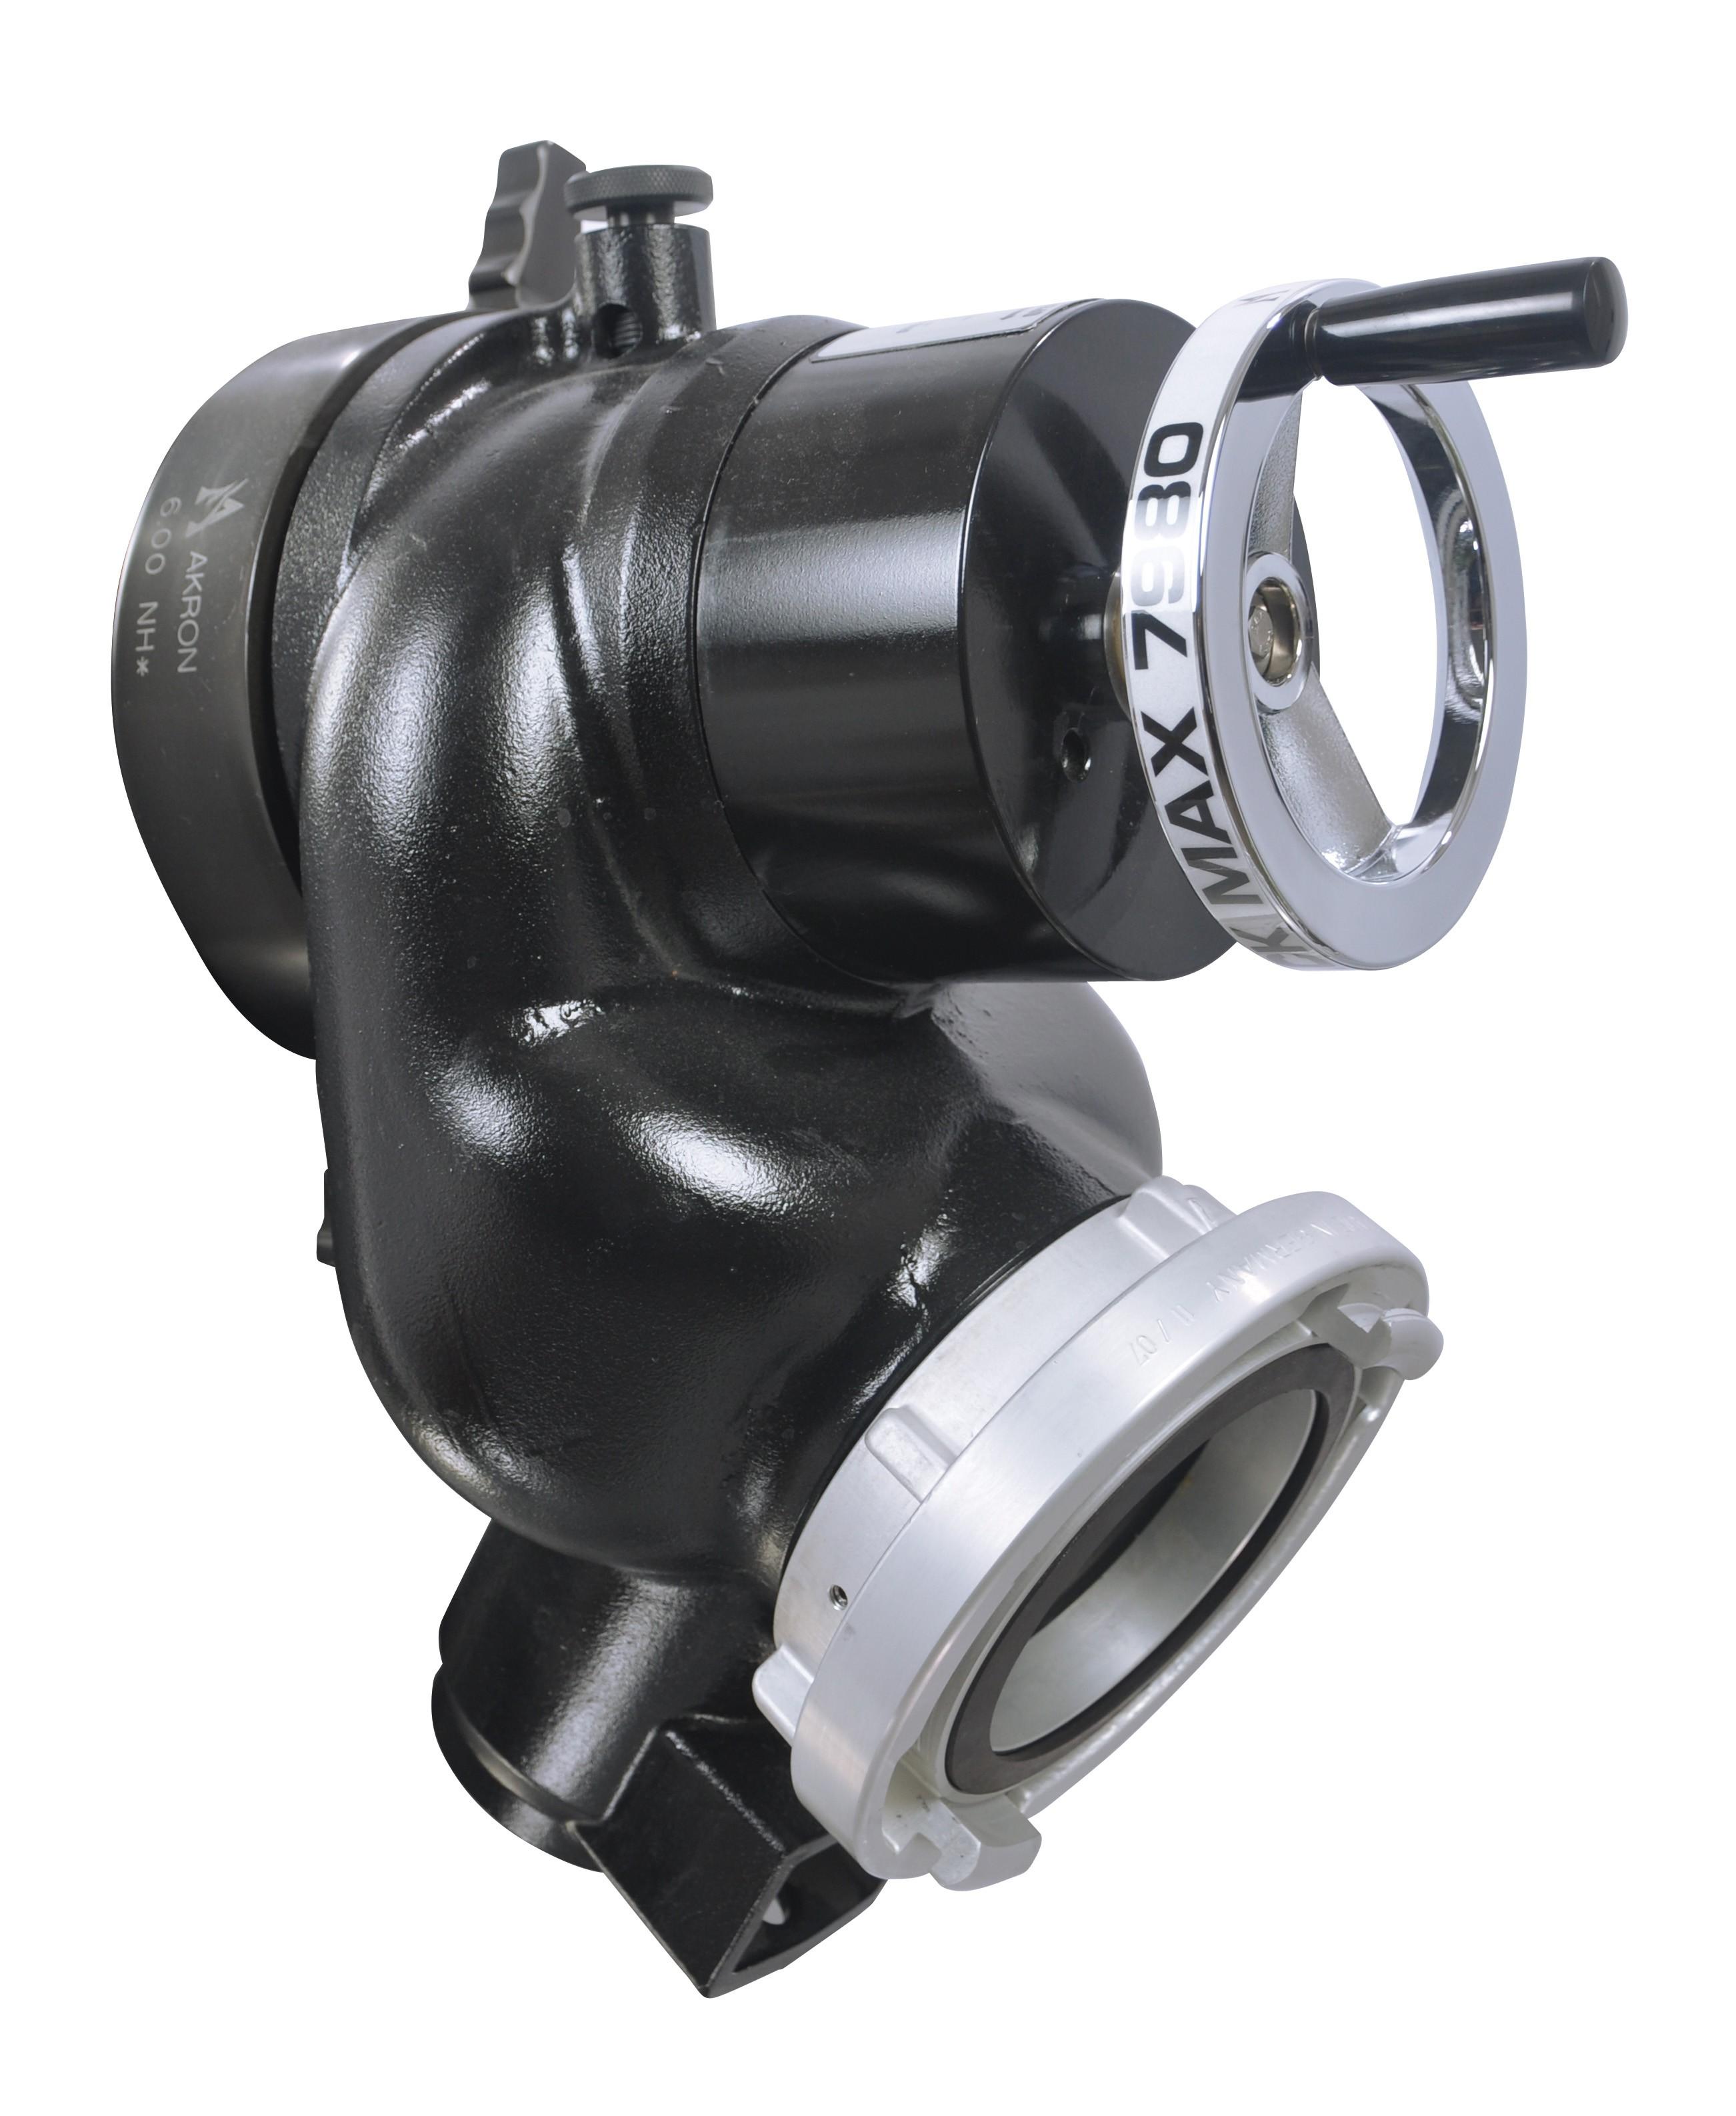 Stainless steel valves black max piston intake valve